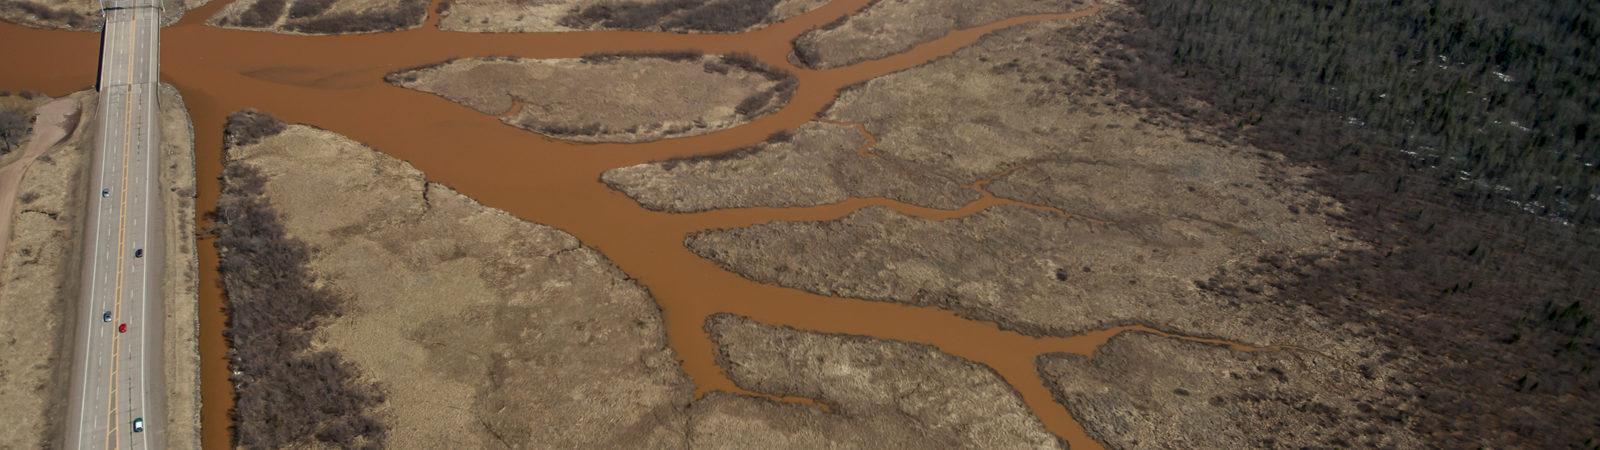 Muddy fish creek watershed